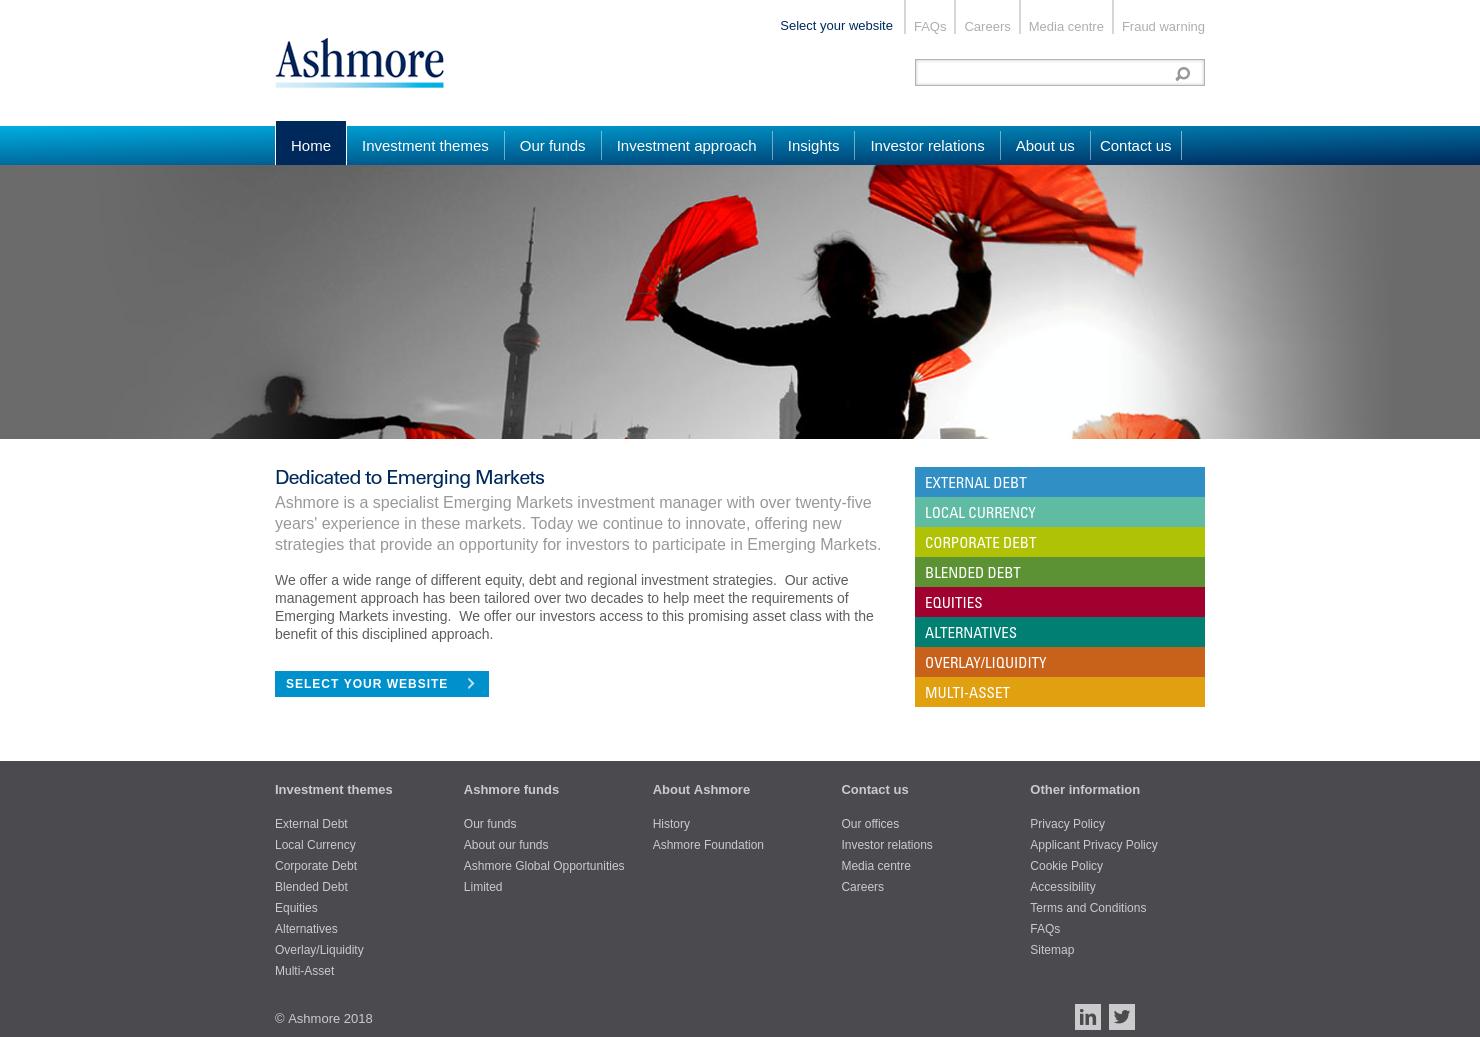 Ashmore Home Page